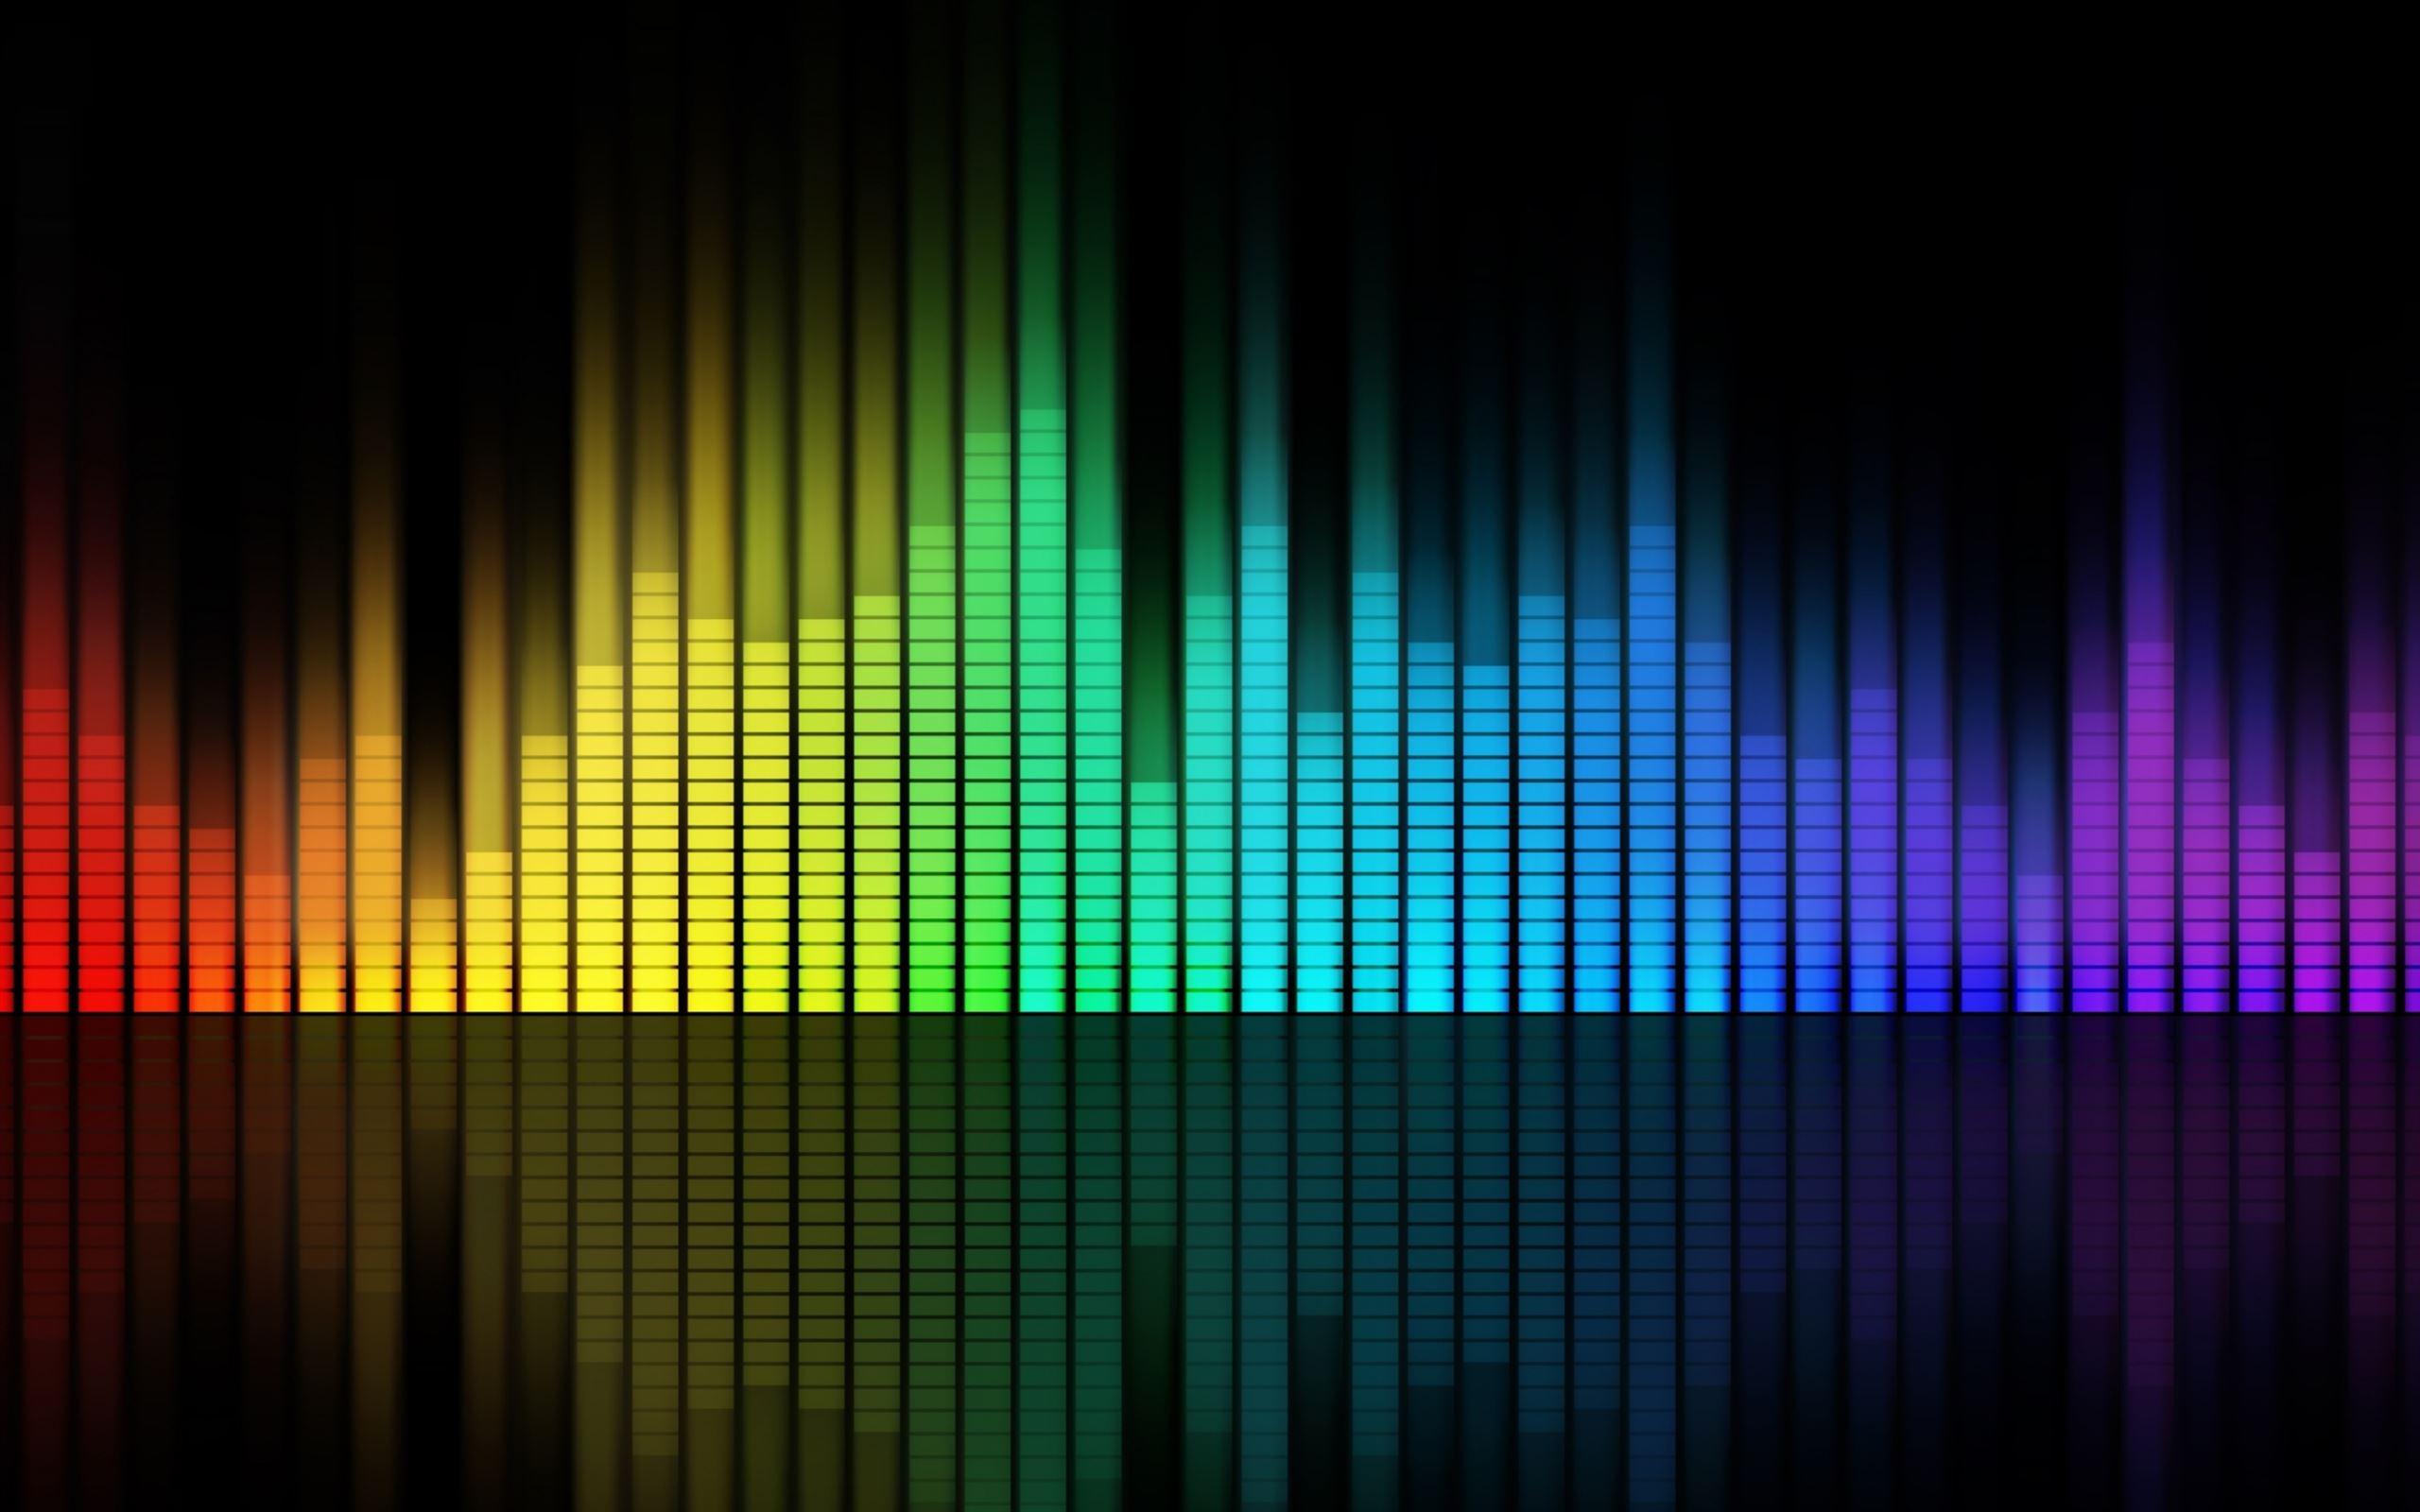 Music Equalizer Mac Wallpaper Download | AllMacWallpaper